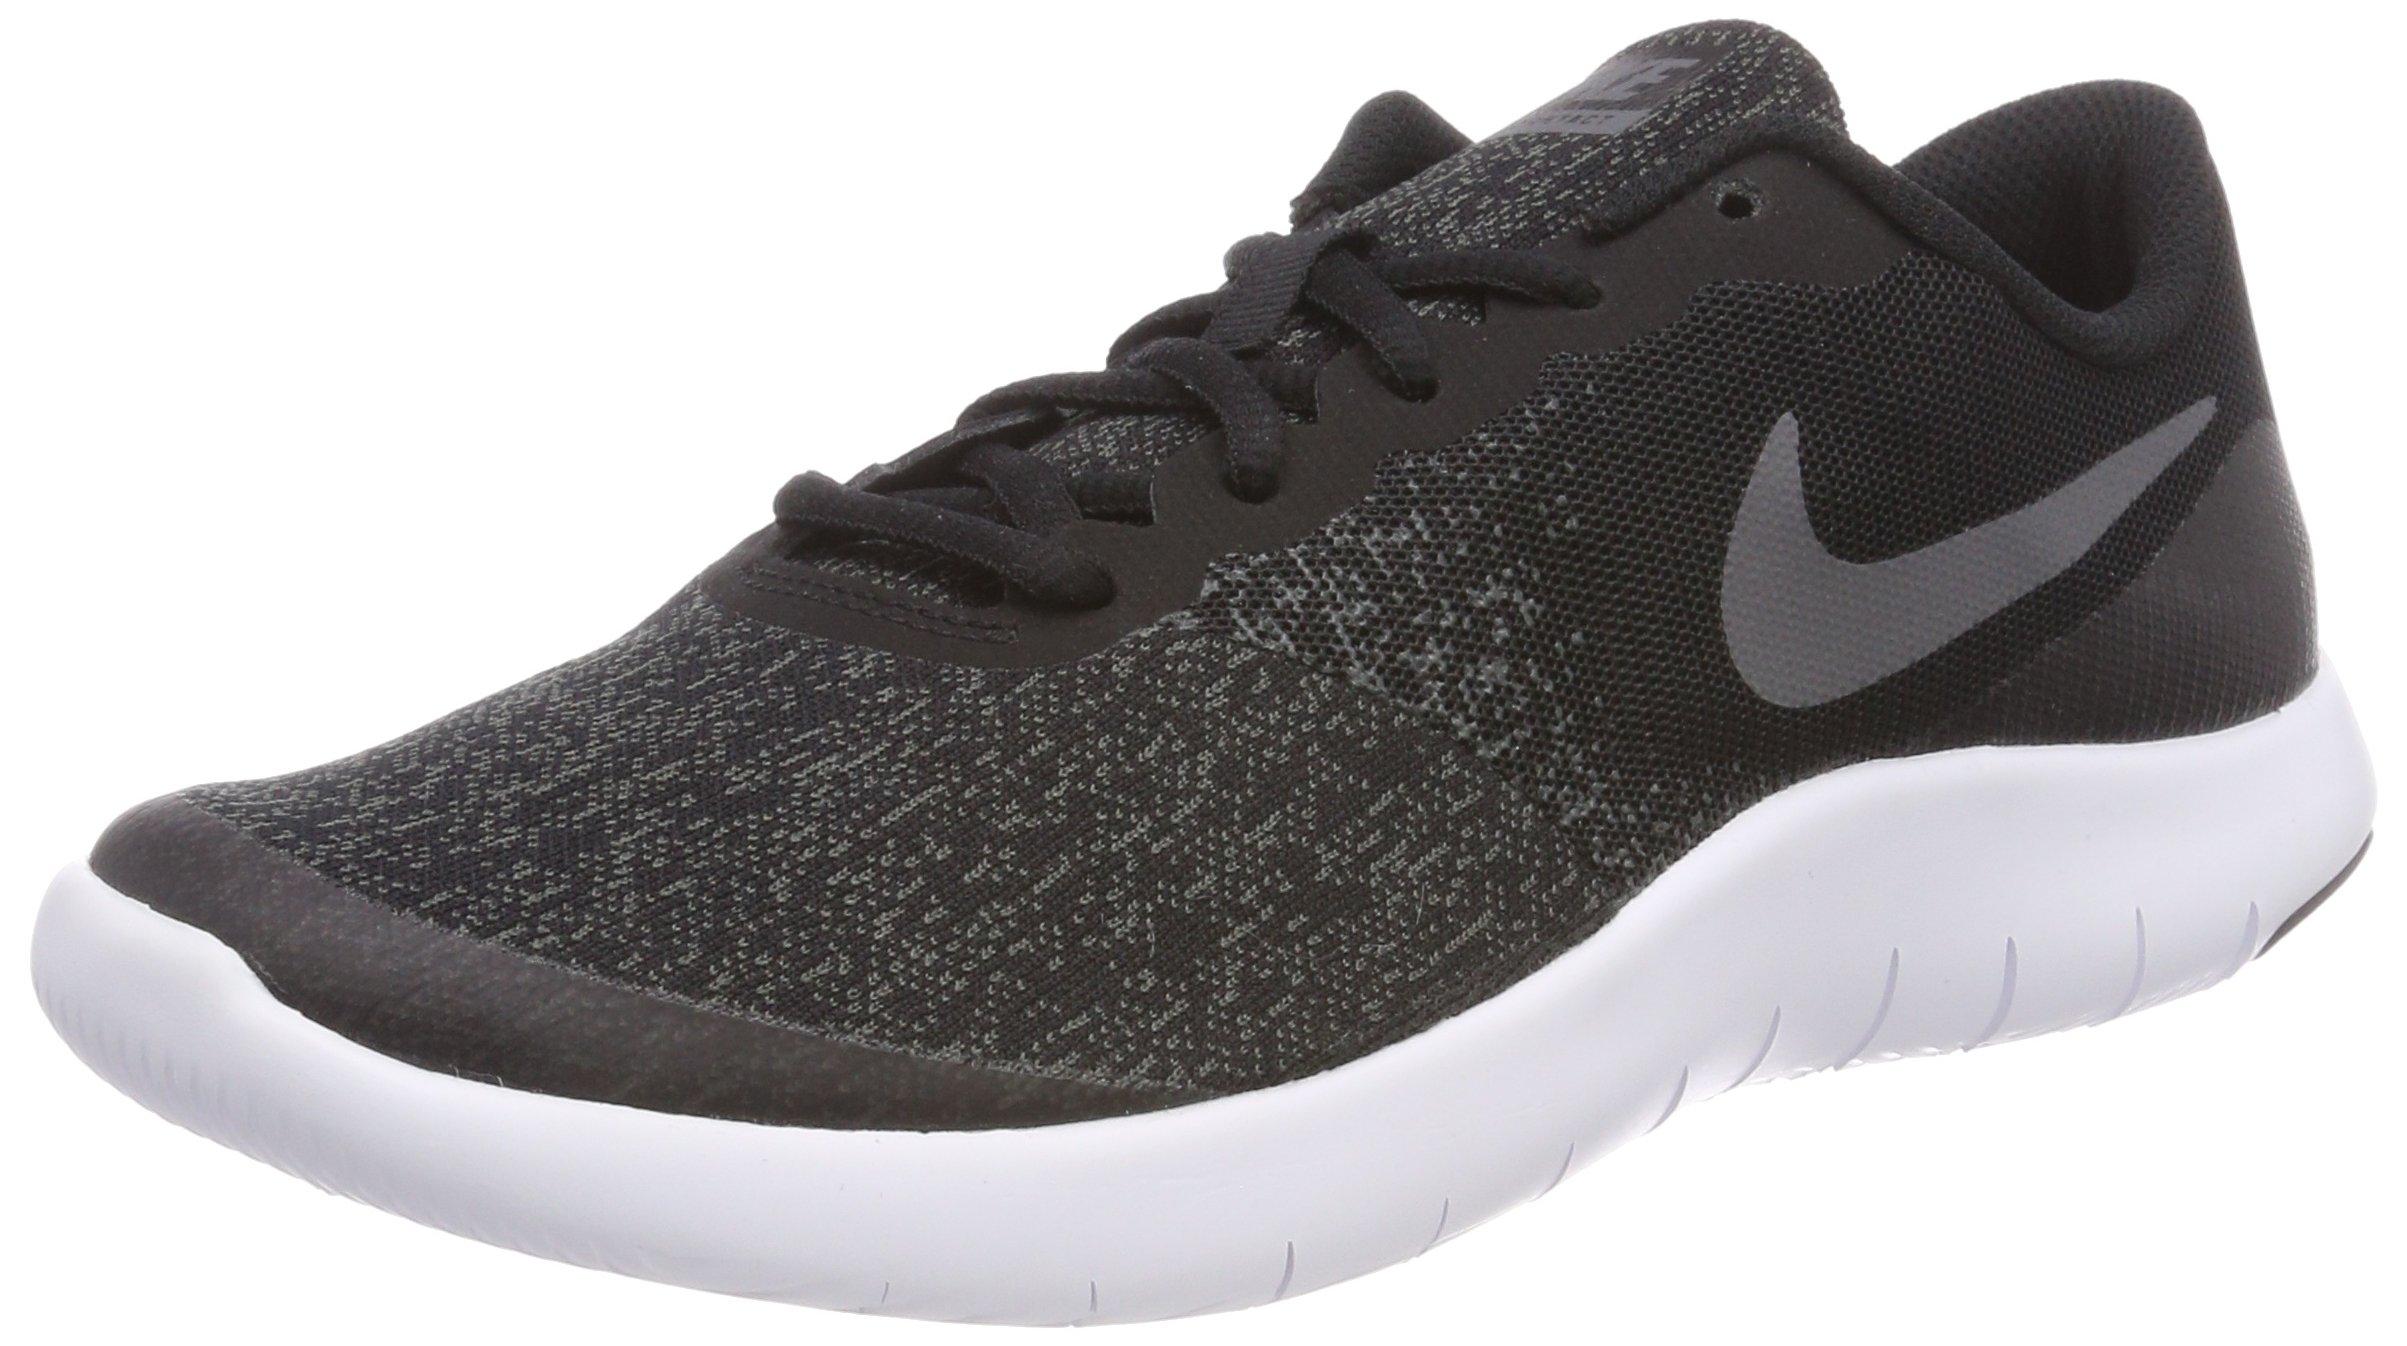 Nike Kids Flex Contact (GS) Black/Dark Grey/Anthracite Running Shoe 6.5 Kids US by Nike